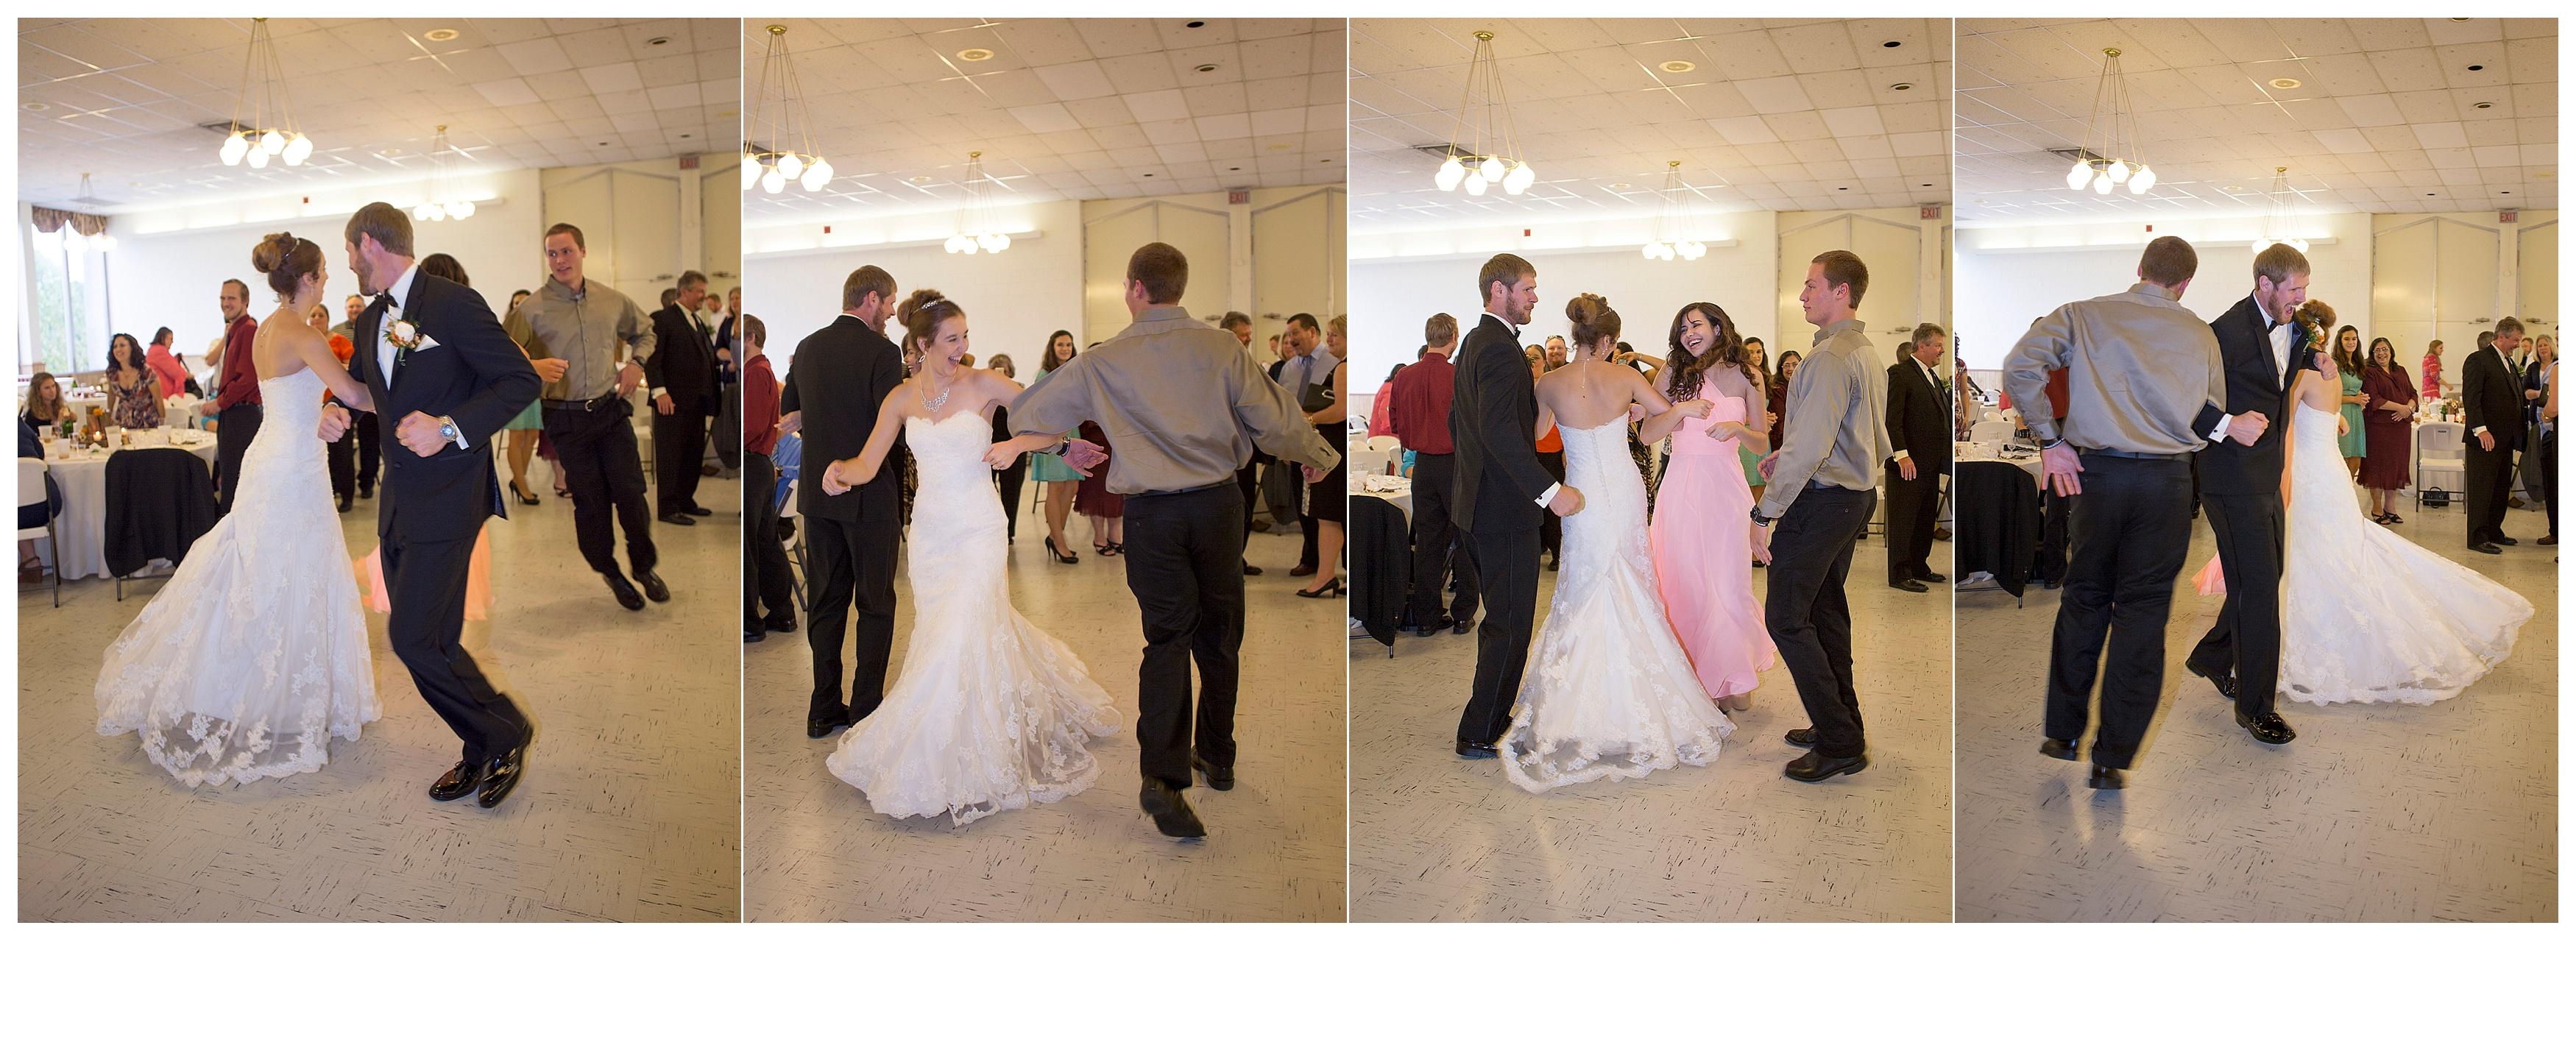 Emily Wedding_594 copy.jpg